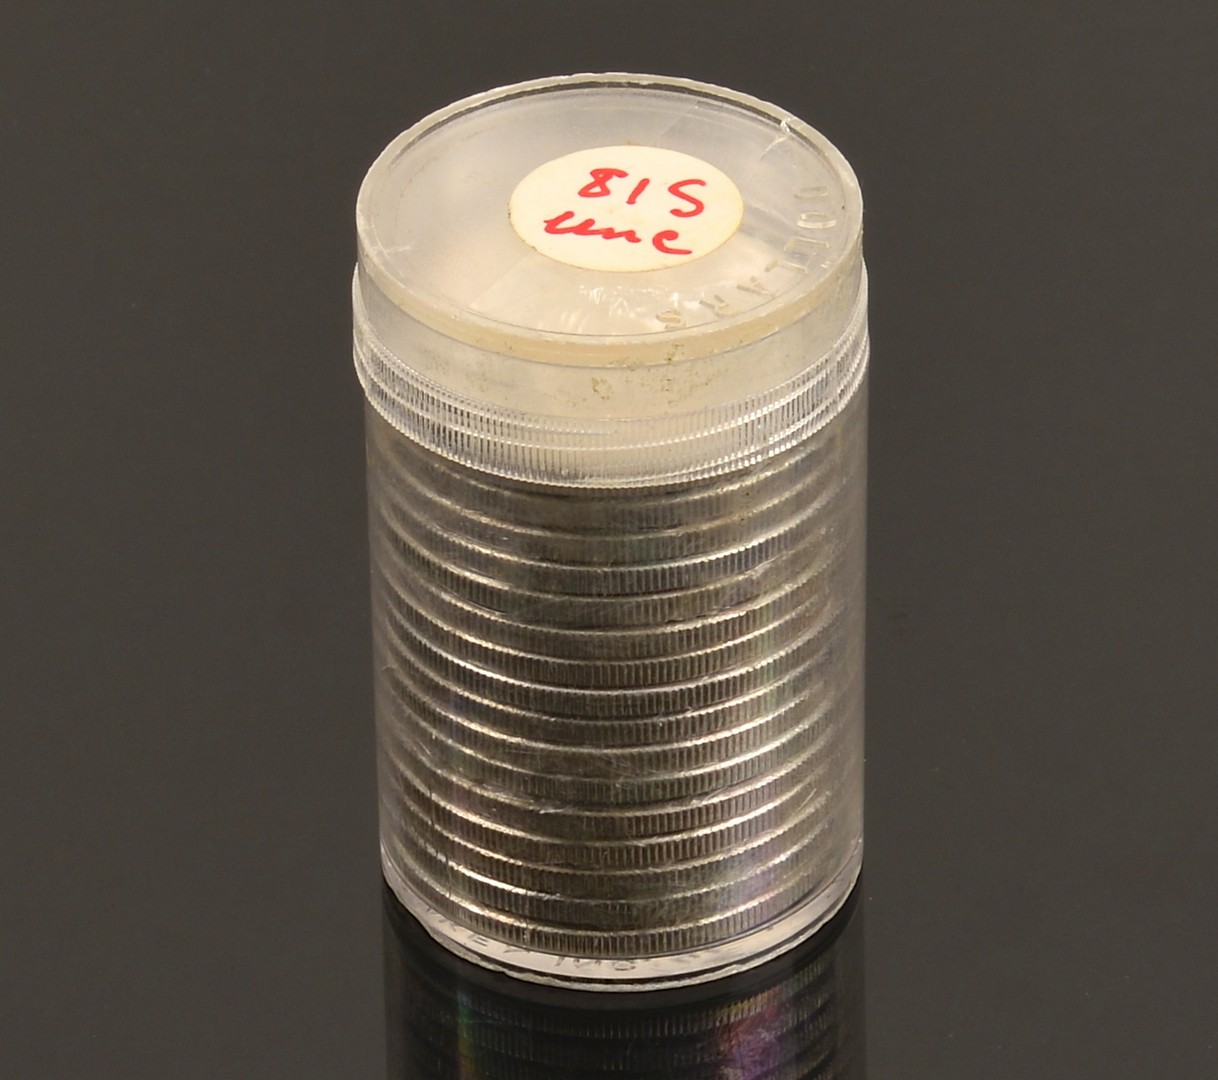 Lot 964: 16 Uncirculated 1881 Morgan Silver Dollars